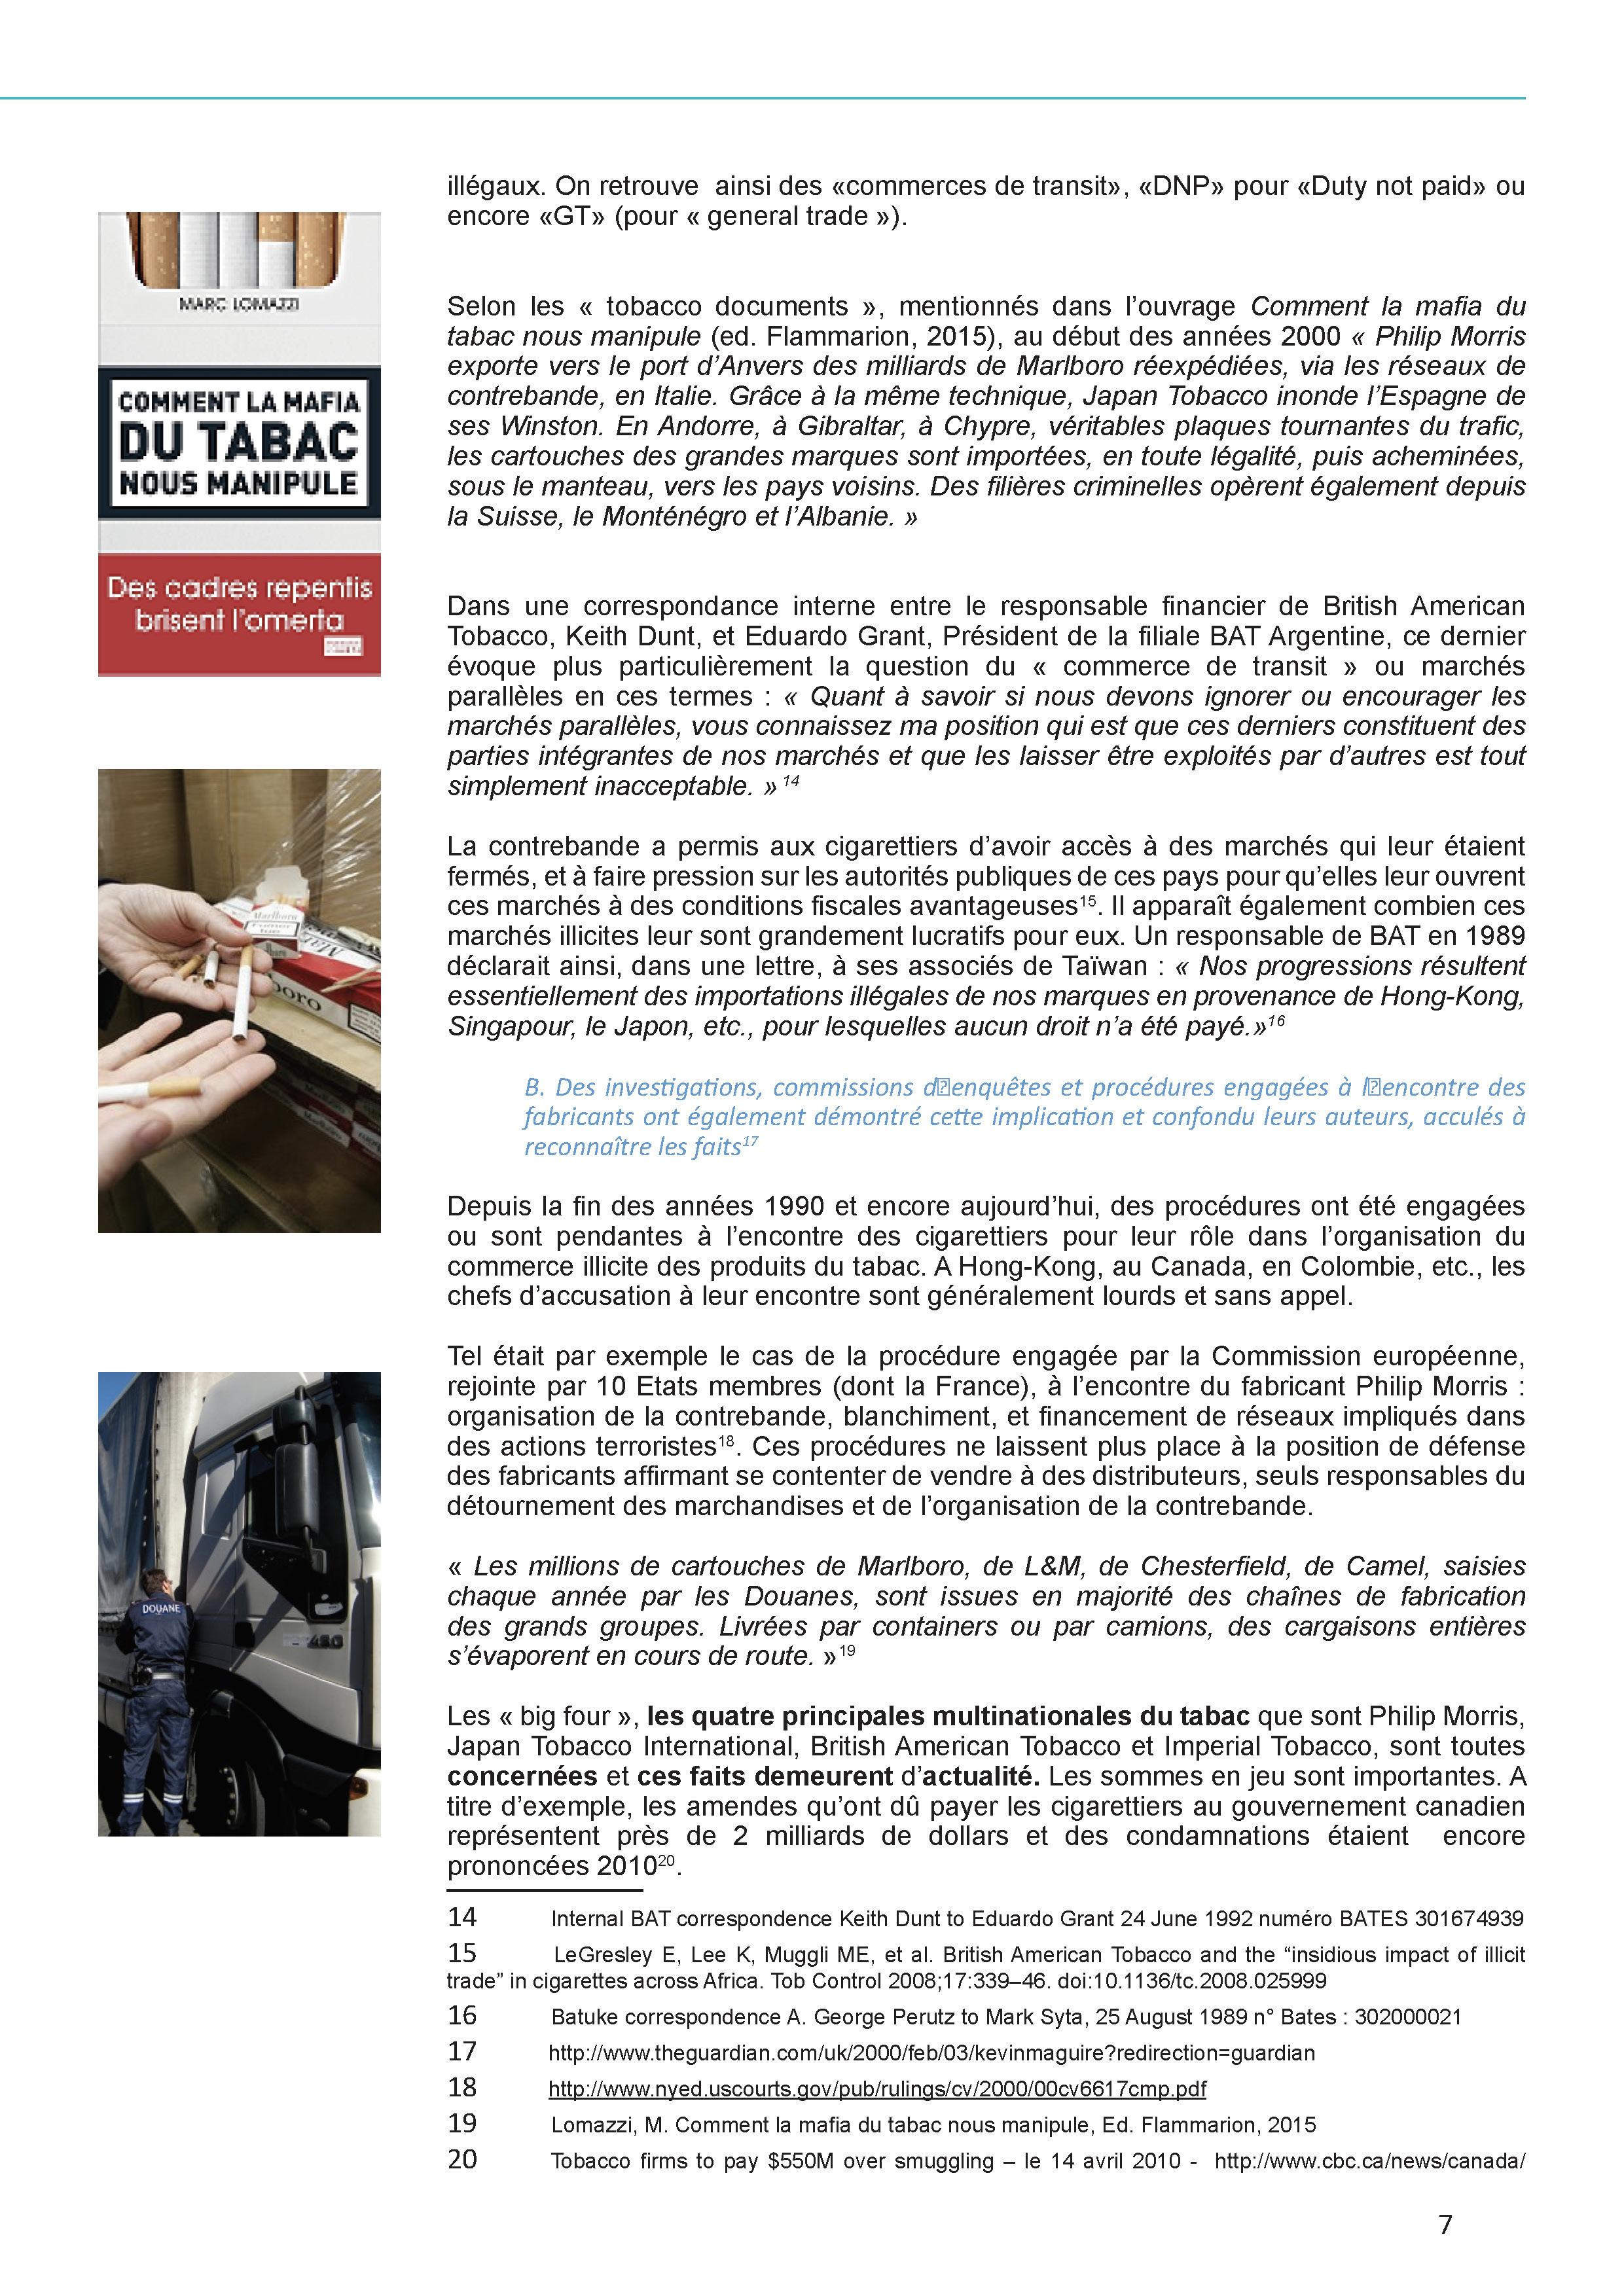 Alliance-DP_commerce-illicite-26mai2015_Page_07.jpg